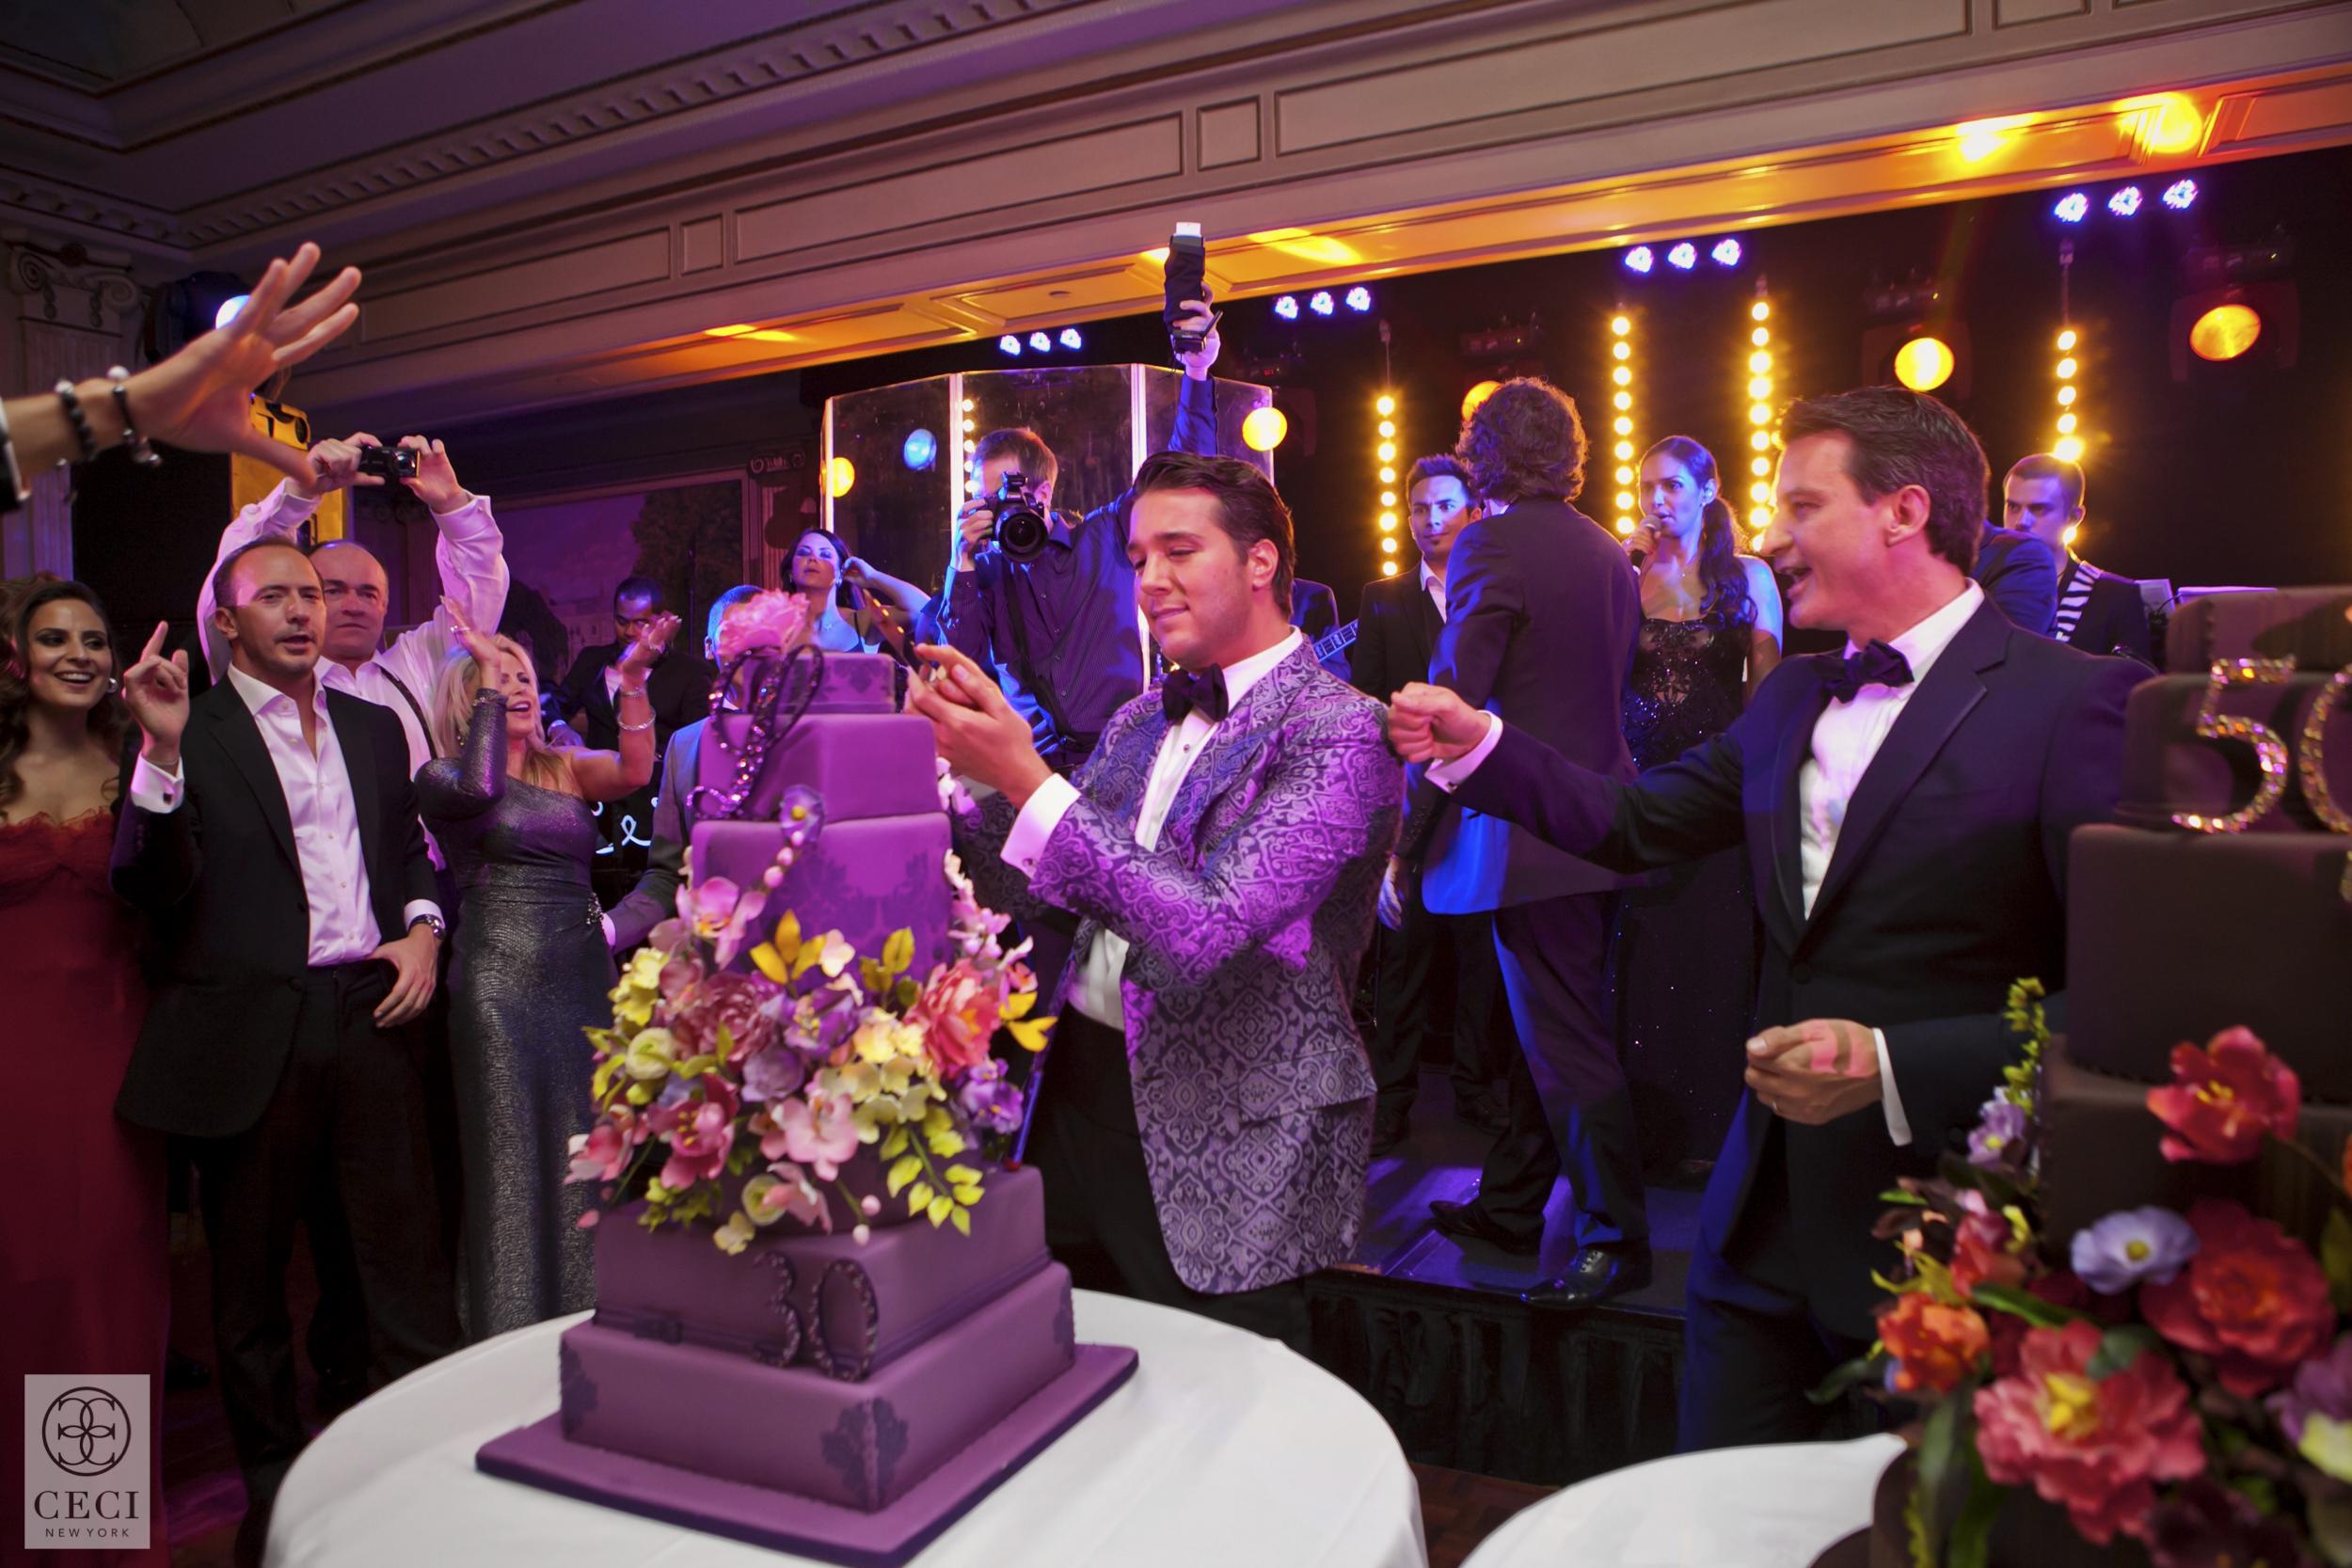 ceci_new_york_lucas_somoza_purple_regal_wediding_birthday_commitment_ceremony_gold-36.jpg